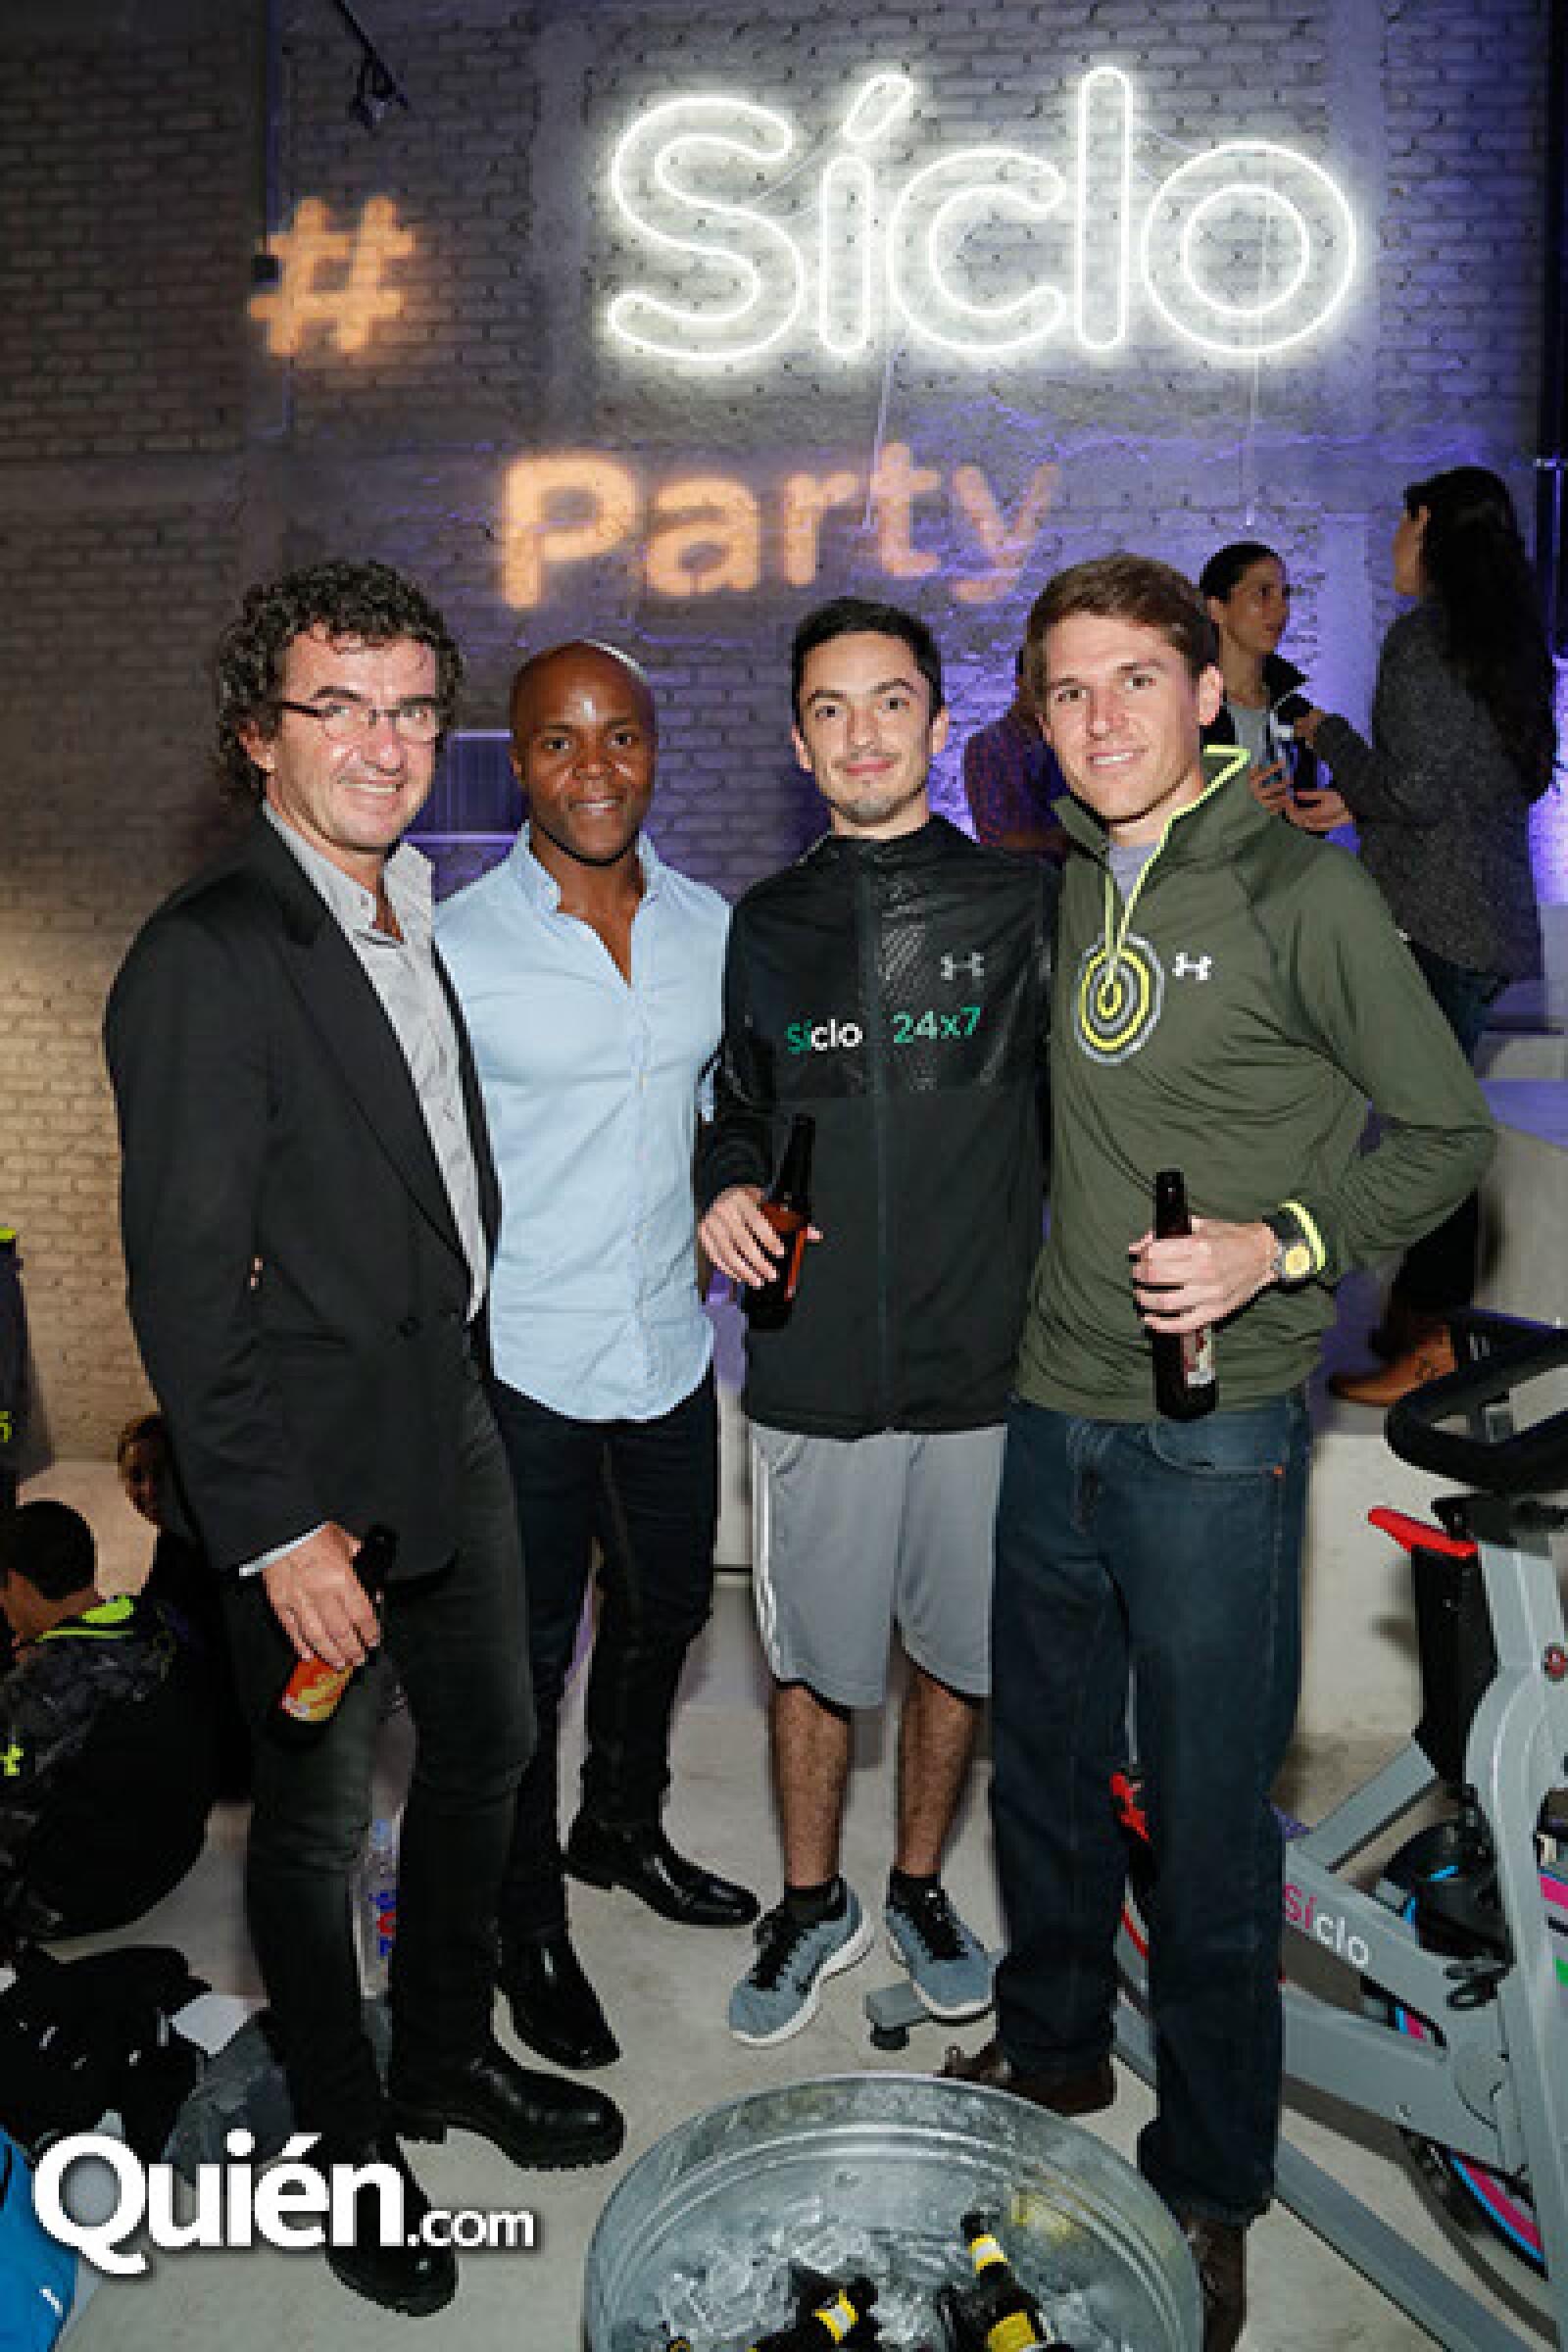 Fredy Helfon, Jeremy Whistine, Pedro de Garay y Alejandro Ramos